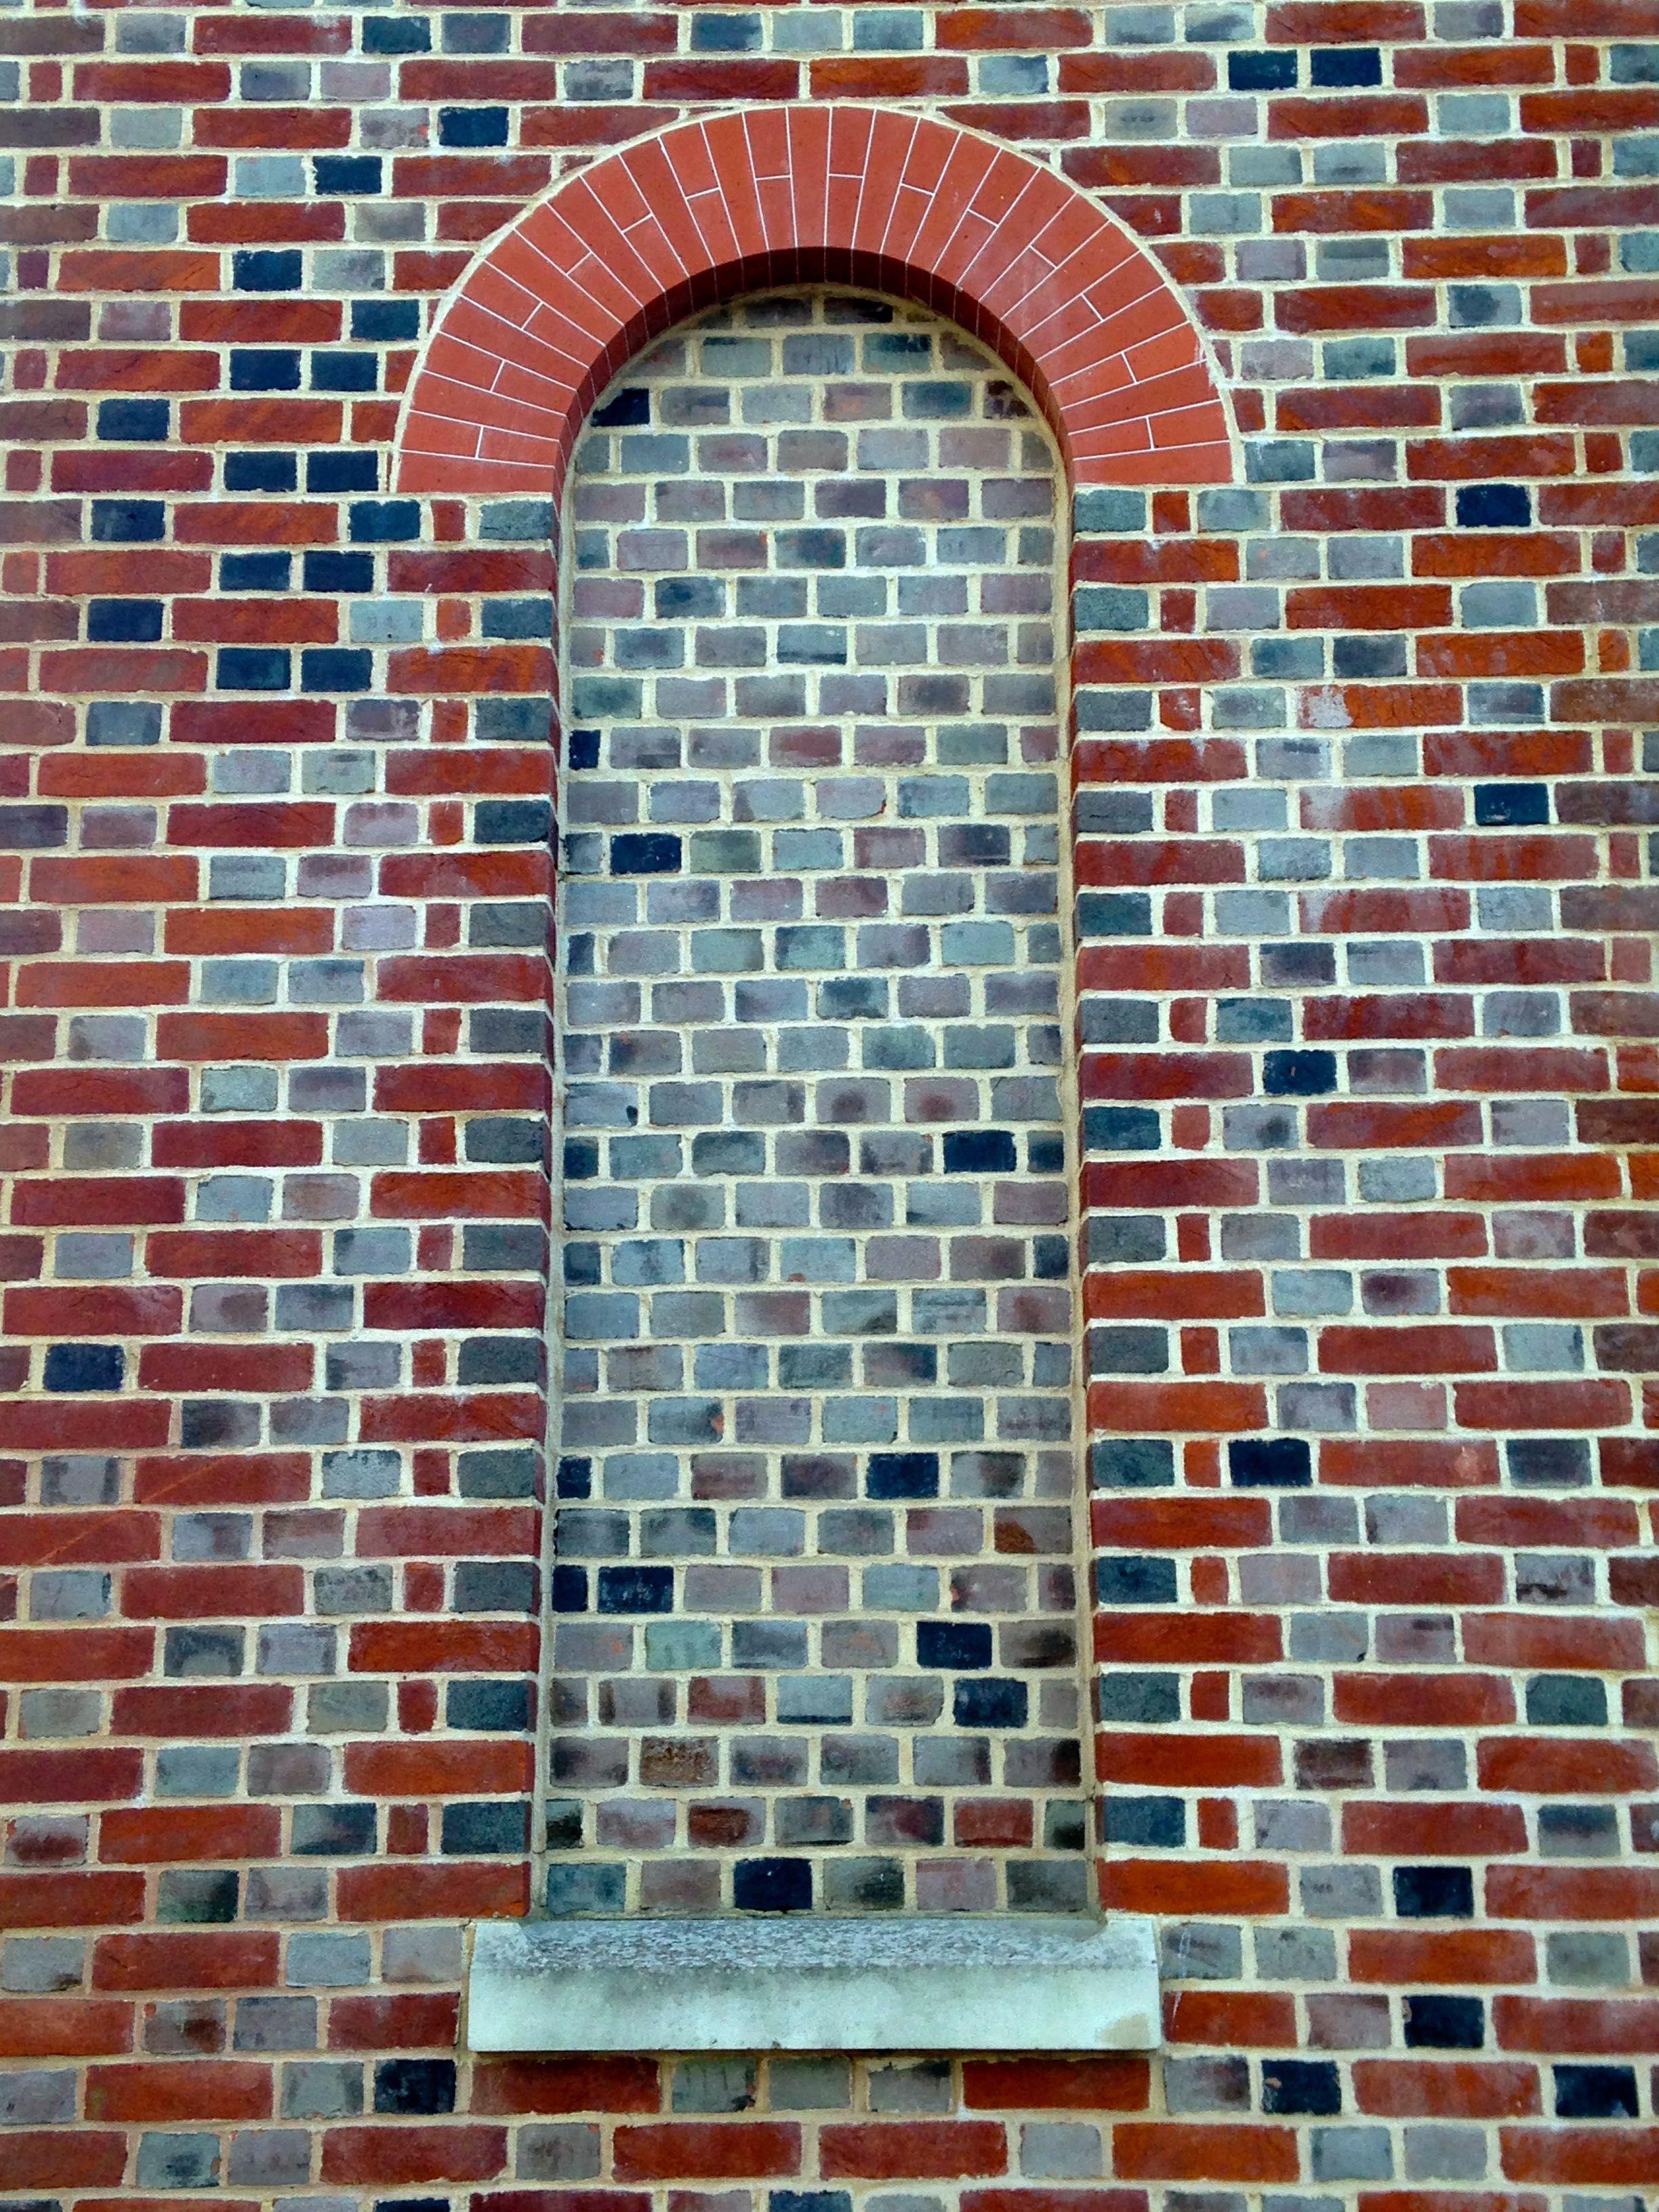 Header Bond Set Within Flemish Bond With Rubber Bricks